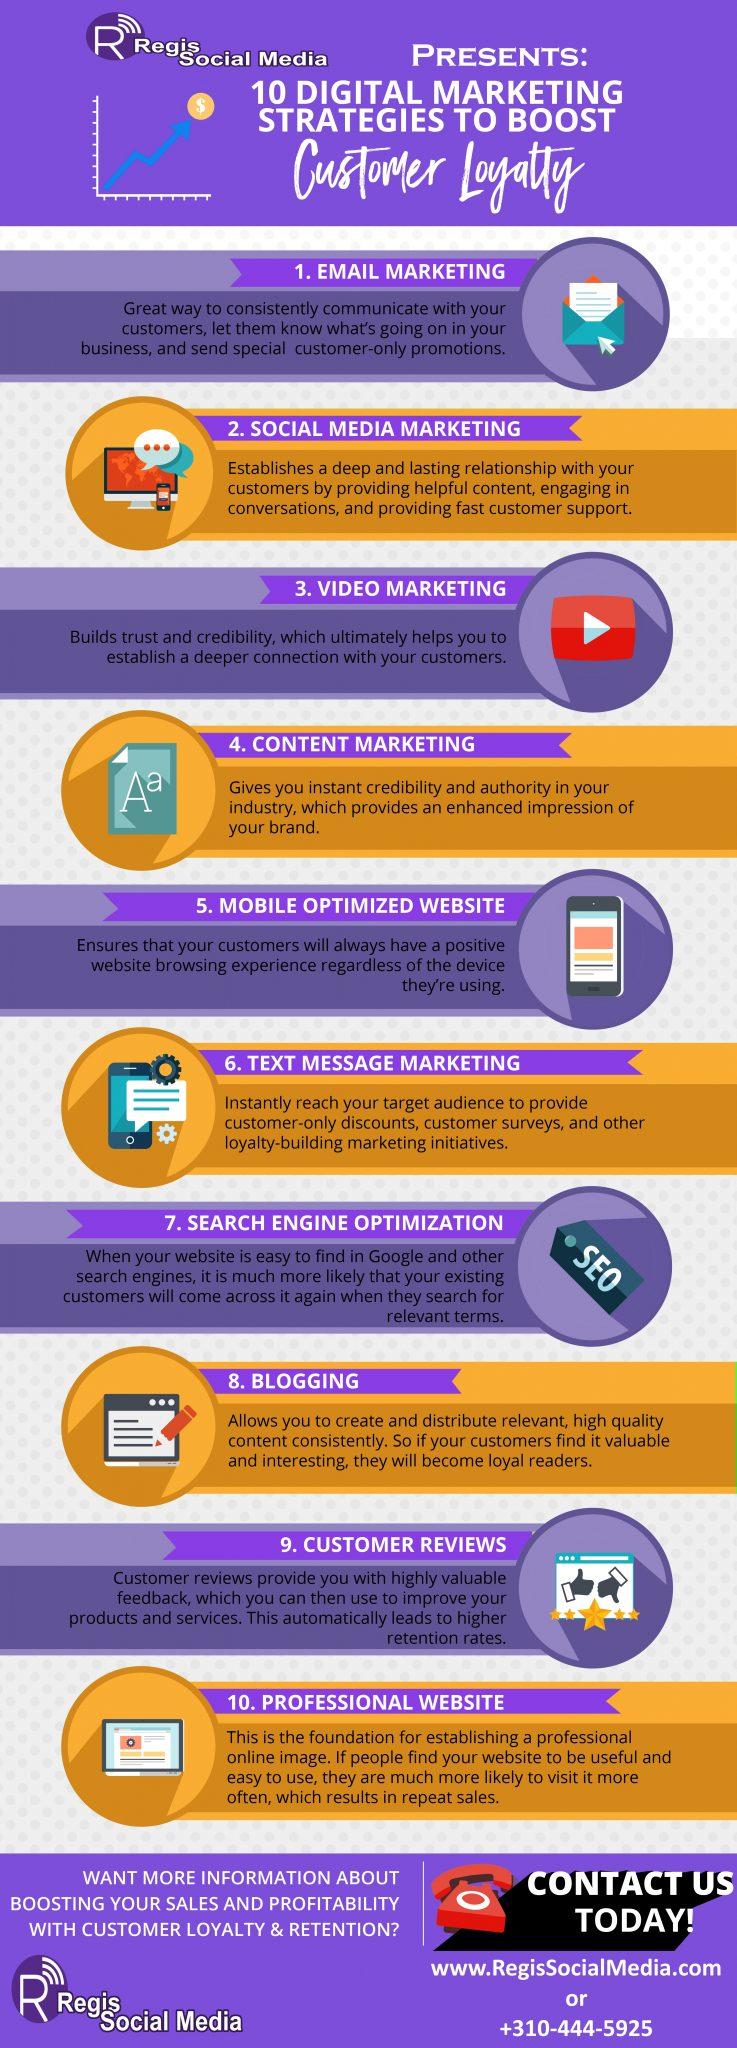 10-digital-marketing-methods-to-increase-customer-loyalty